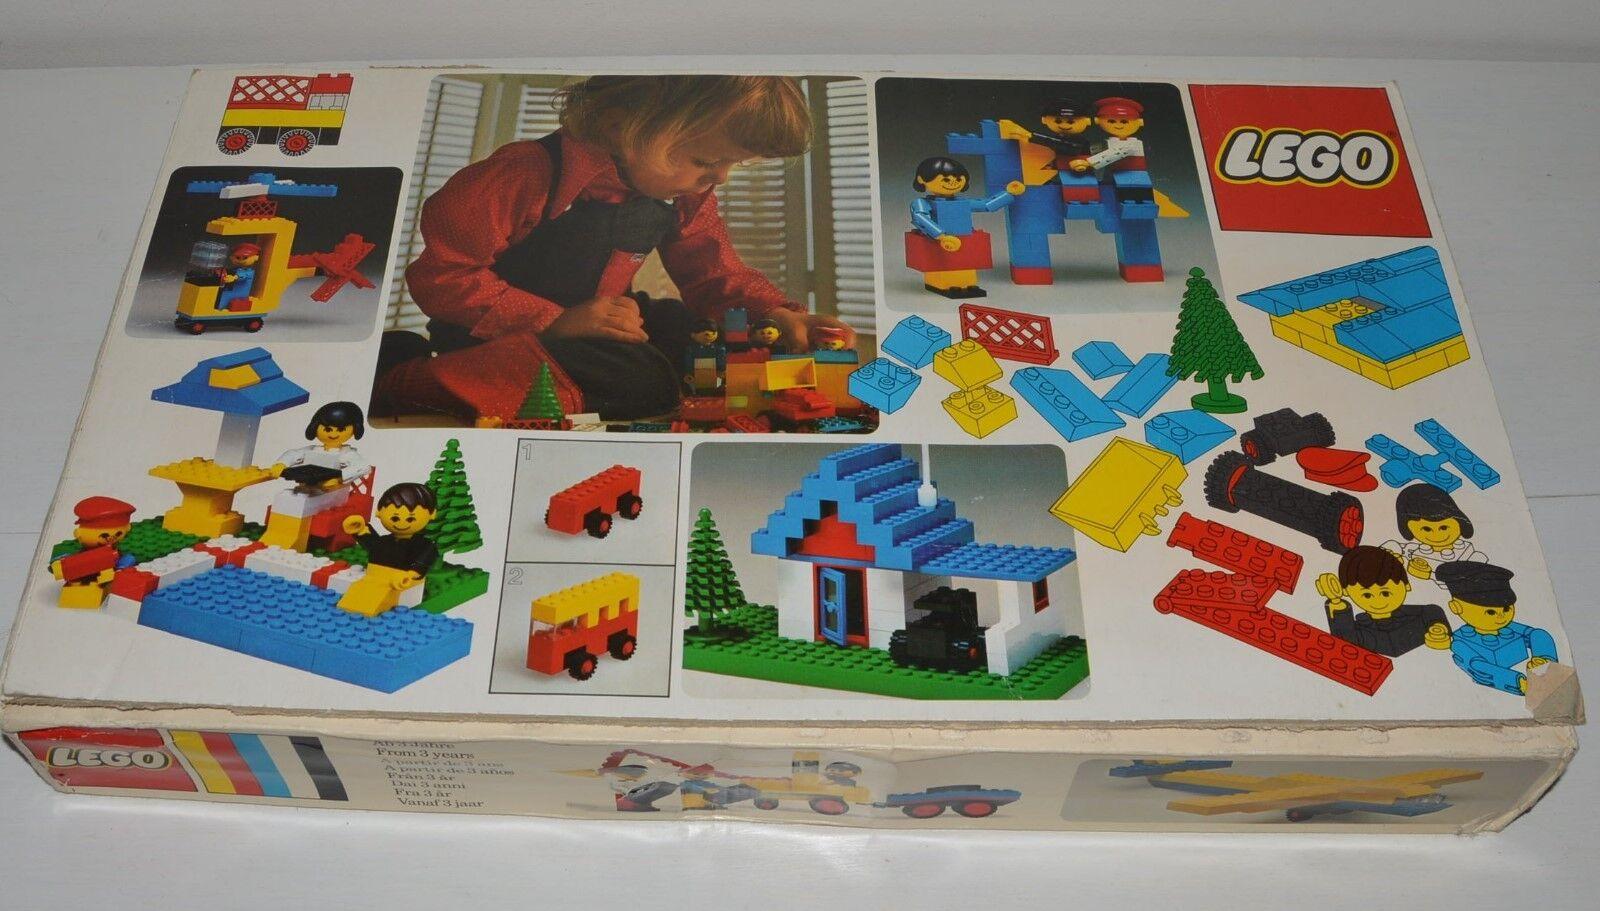 Ancien Jouet construction LEGO vintage boite N° 40   risparmia fino al 50%